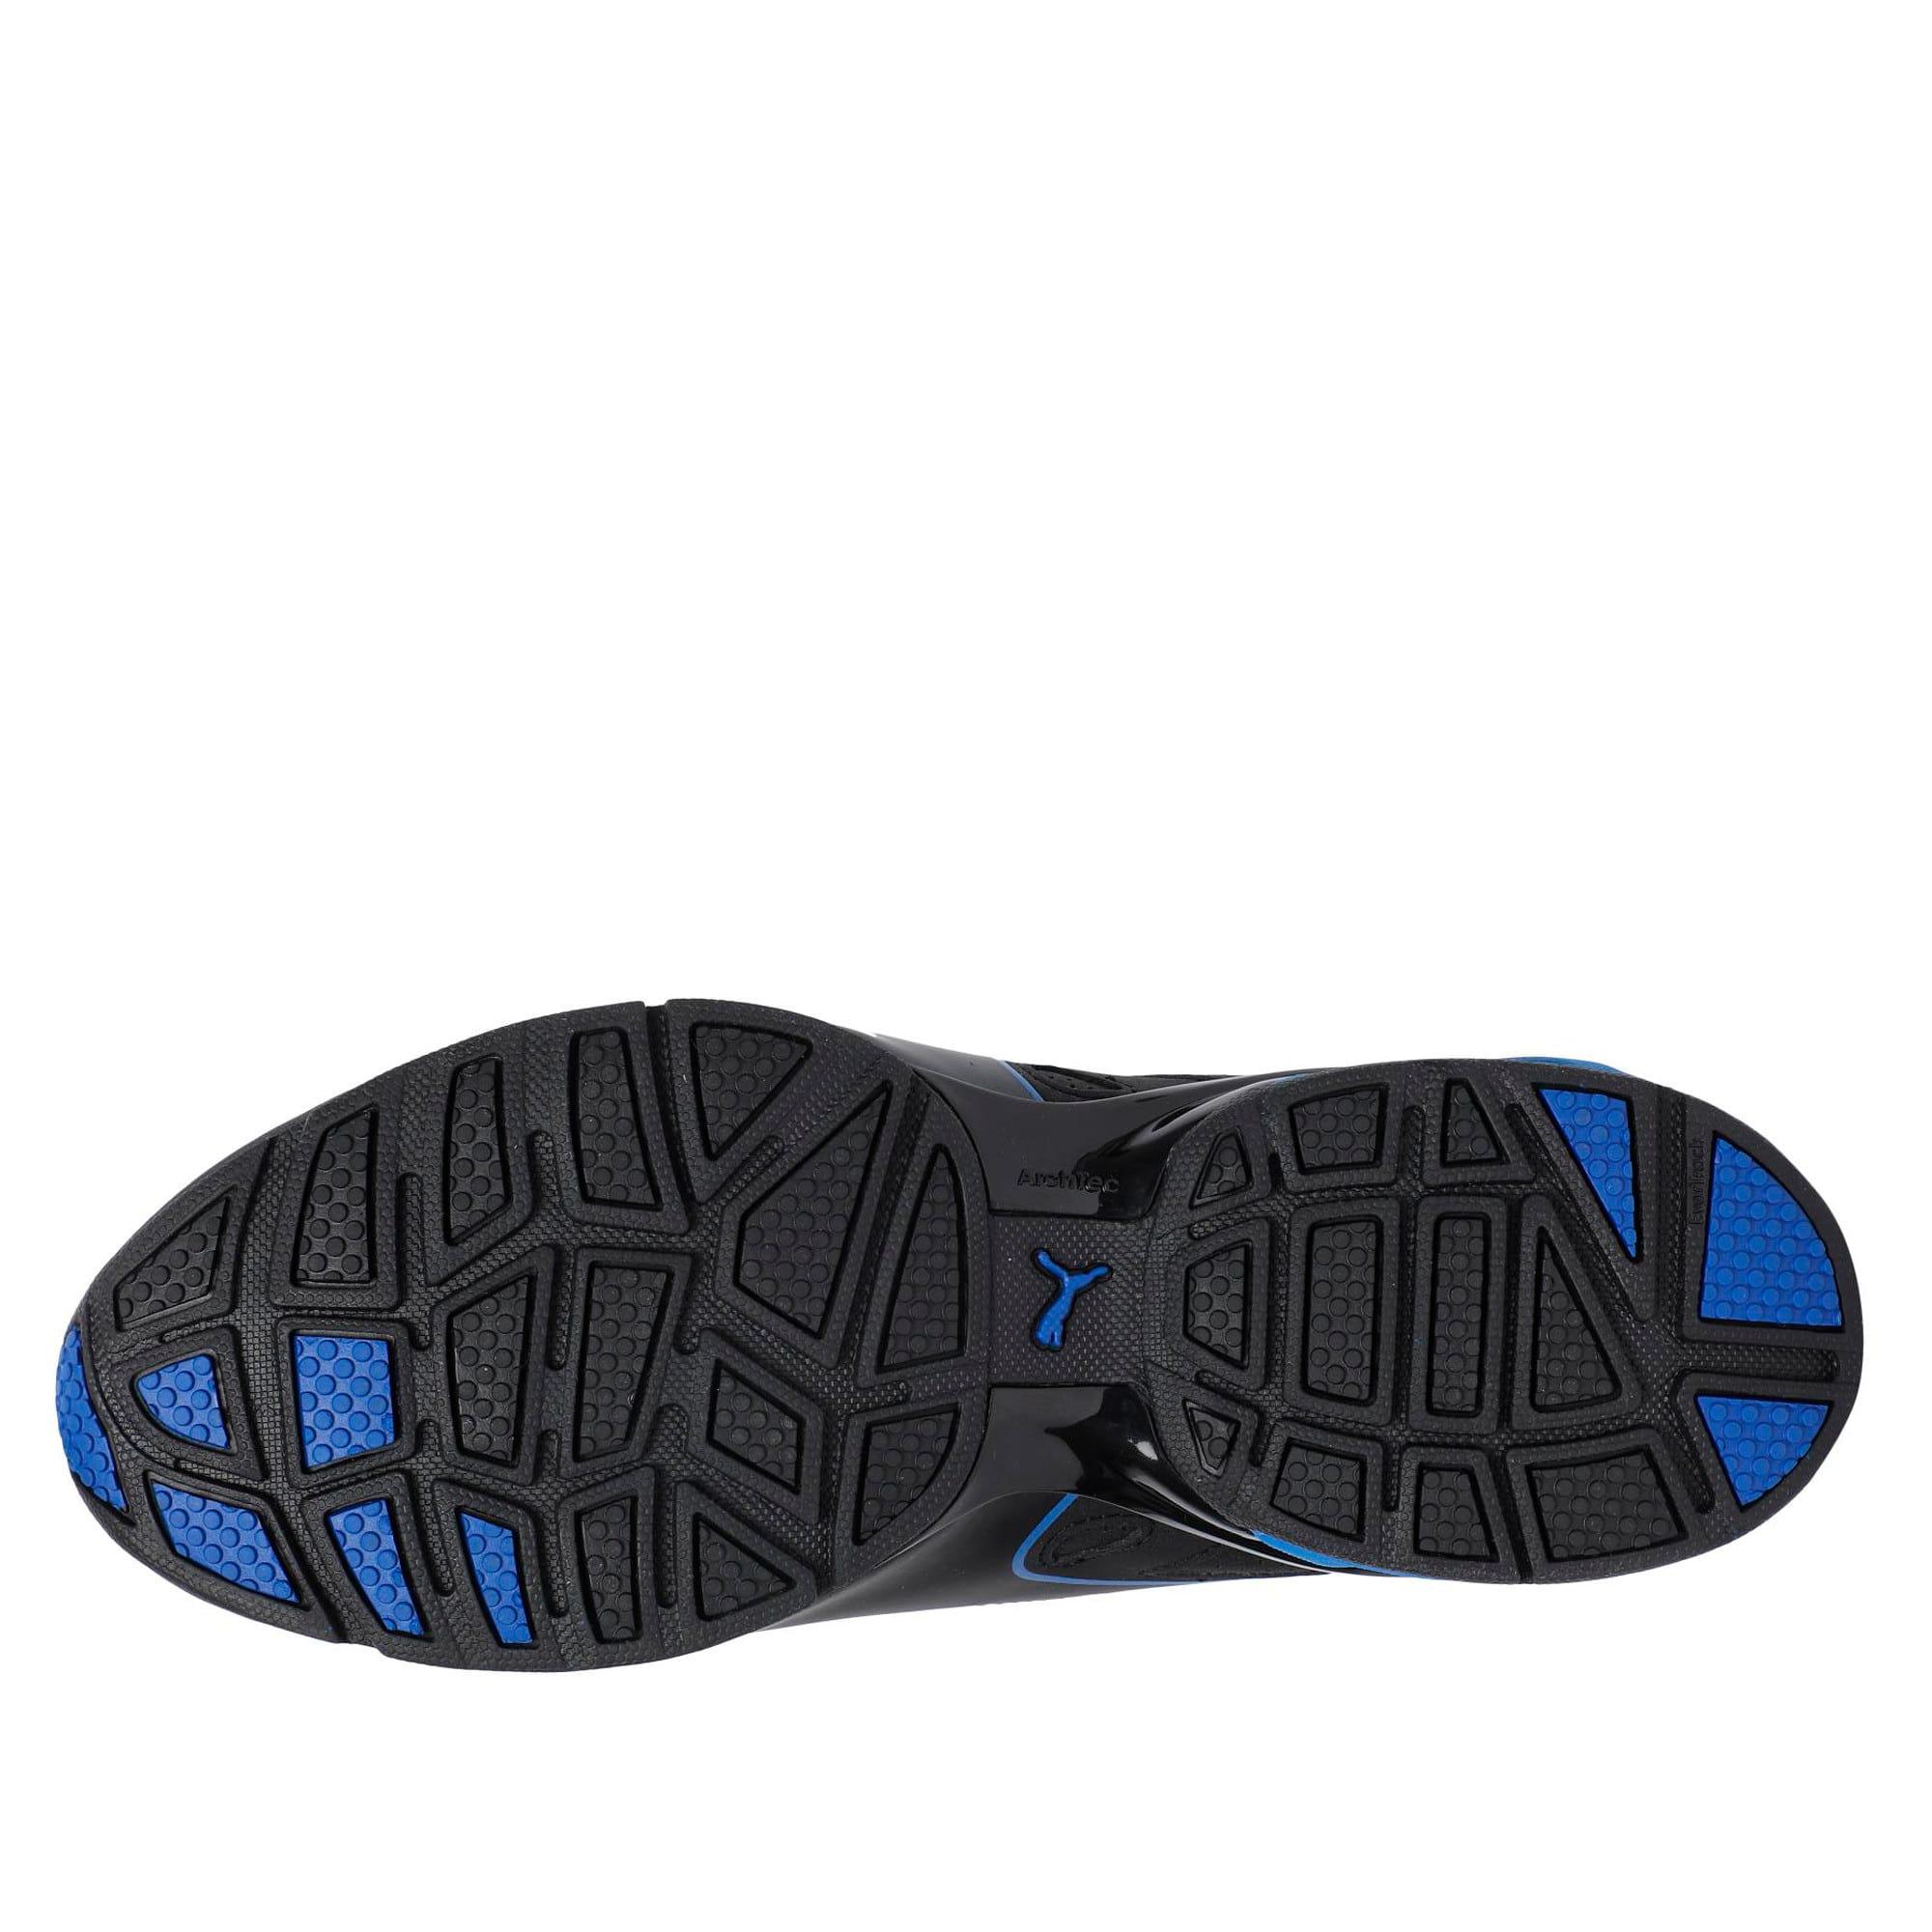 Thumbnail 4 of Tazon Modern SL Men's Running Shoes, Puma Black-Lapis Blue, medium-IND